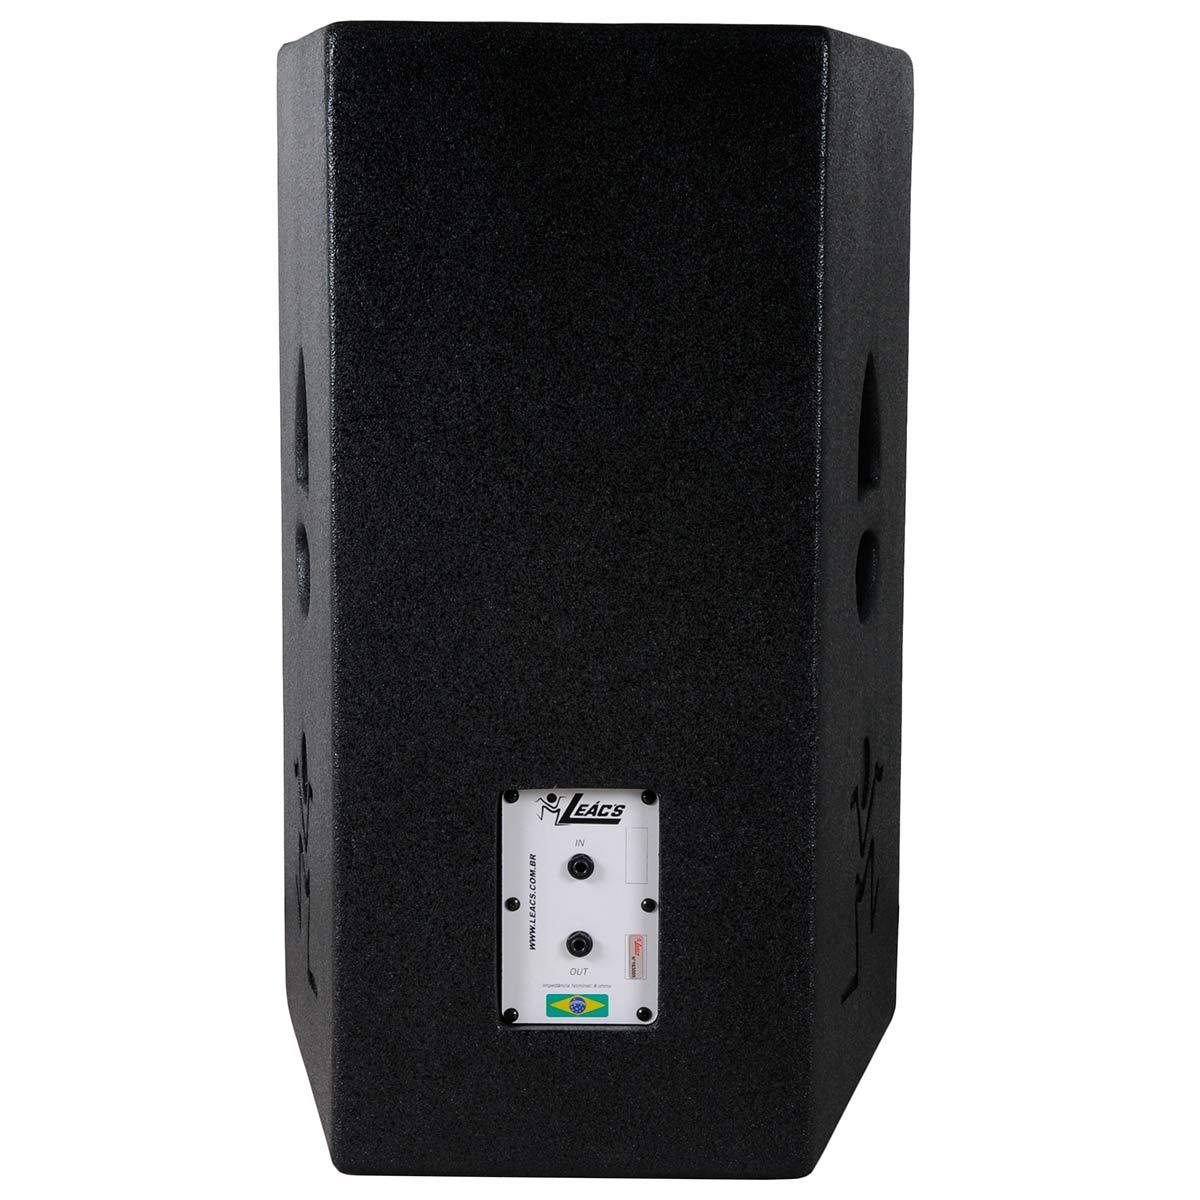 Caixa Passiva 250W Happy 15 TI ( 2 Vias ) - Leacs